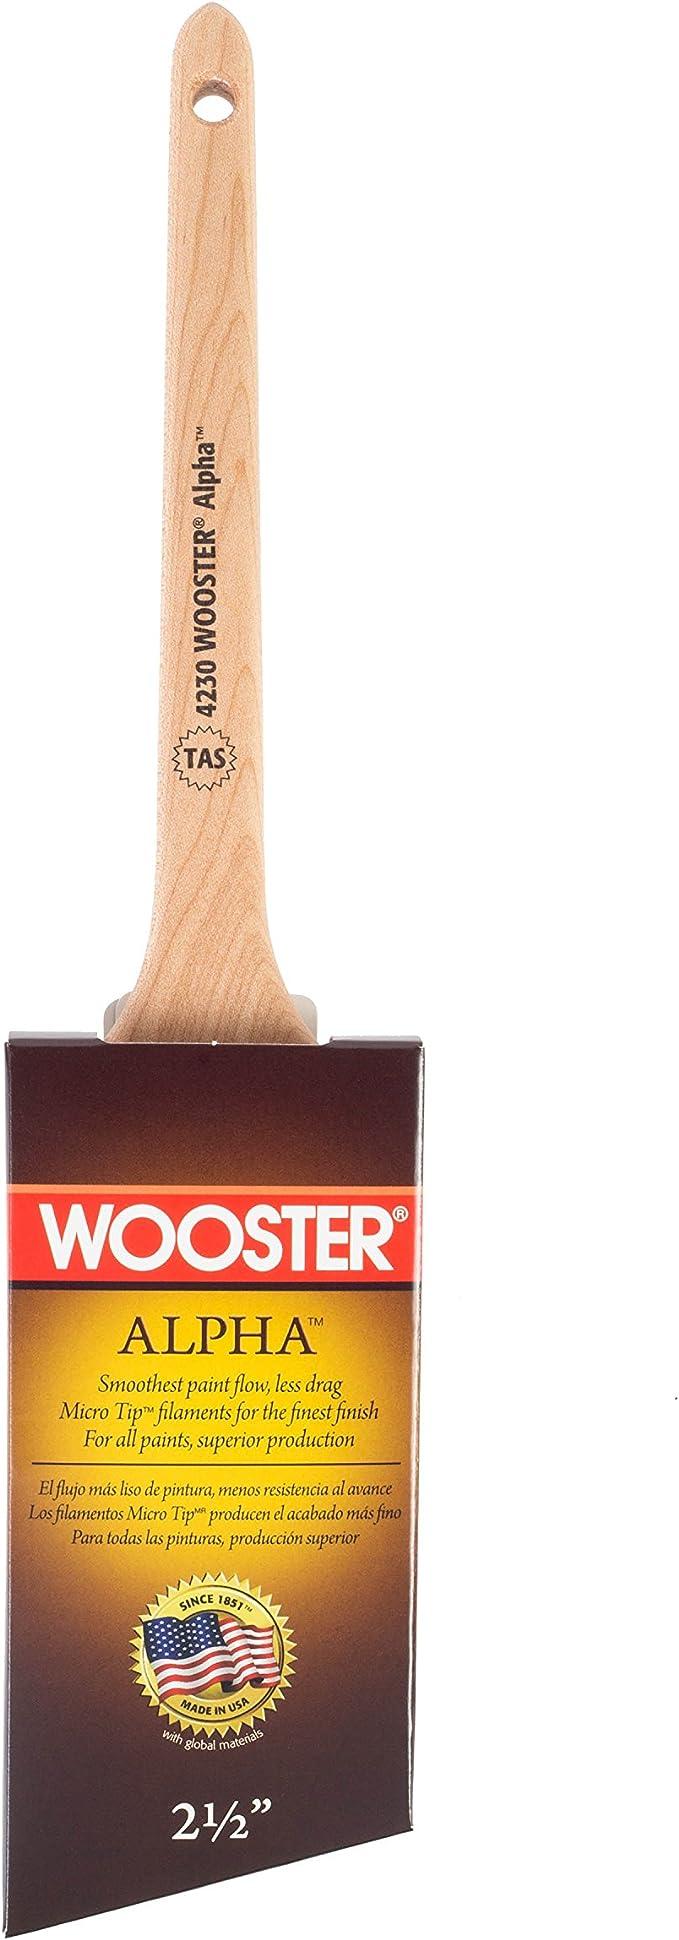 Alpha Thin Angle Sash Brush,No 4230-2 1//2 Wooster Brush